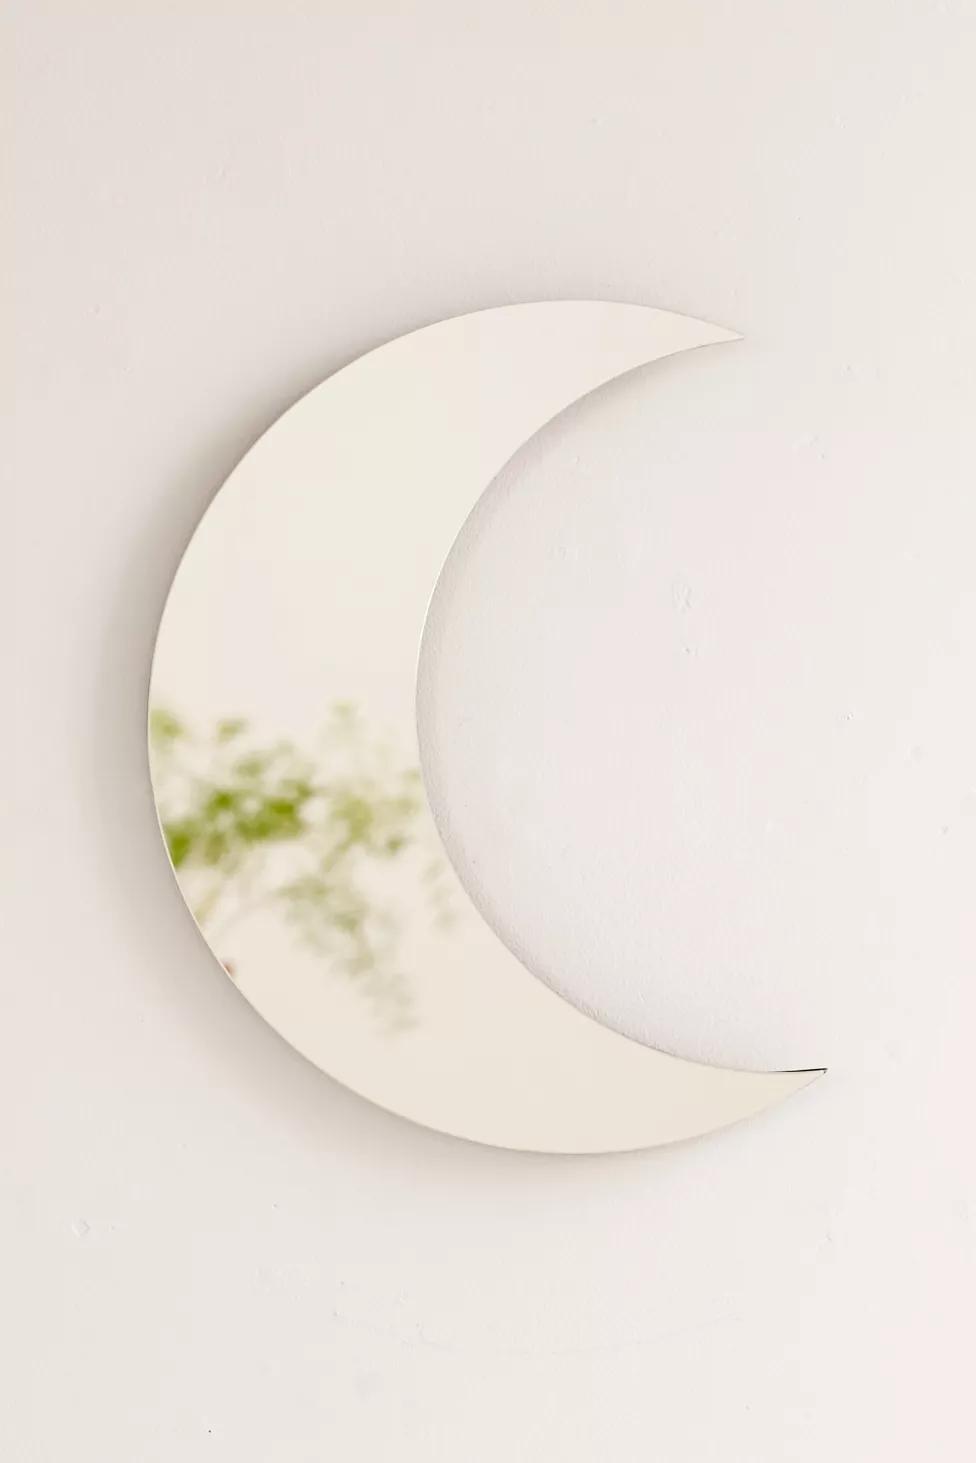 Crescent Moon Mirror Urban Outfitters Home Decor Online Retro Home Decor Inexpensive Home Decor